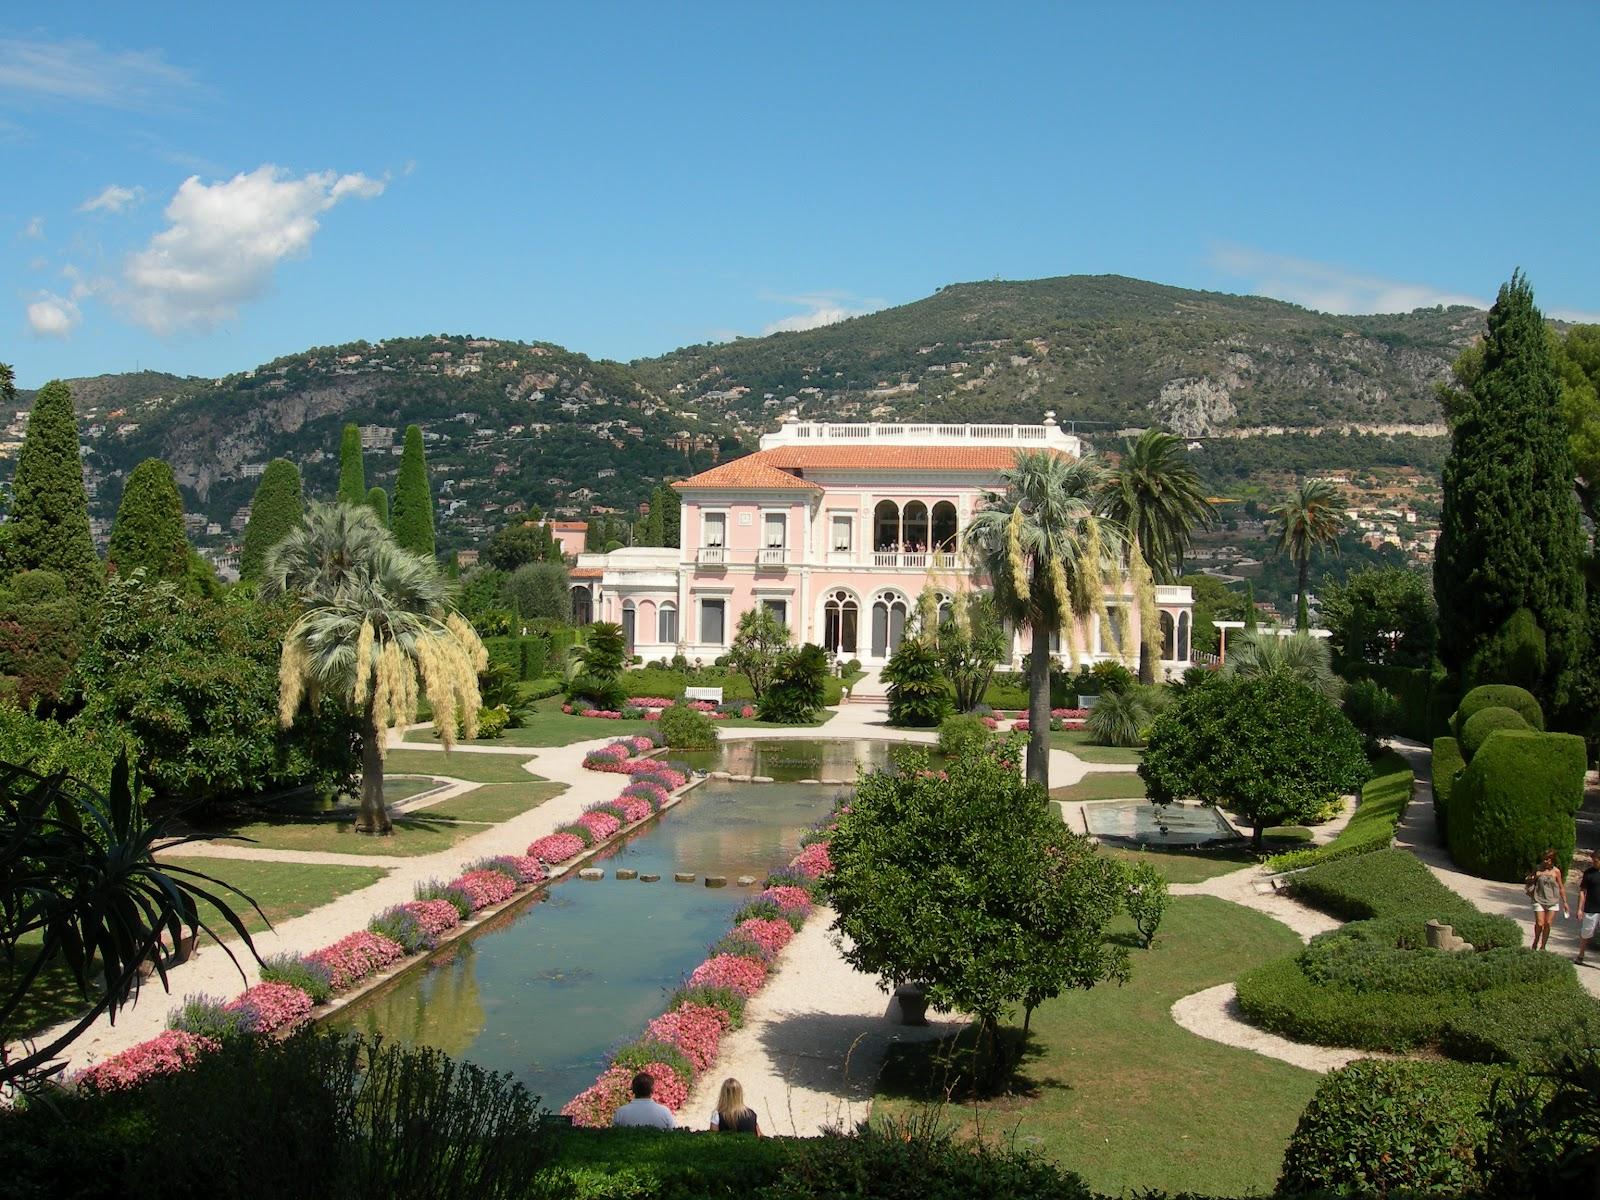 James Bond Locations Villa Ephrussi De Rothschild